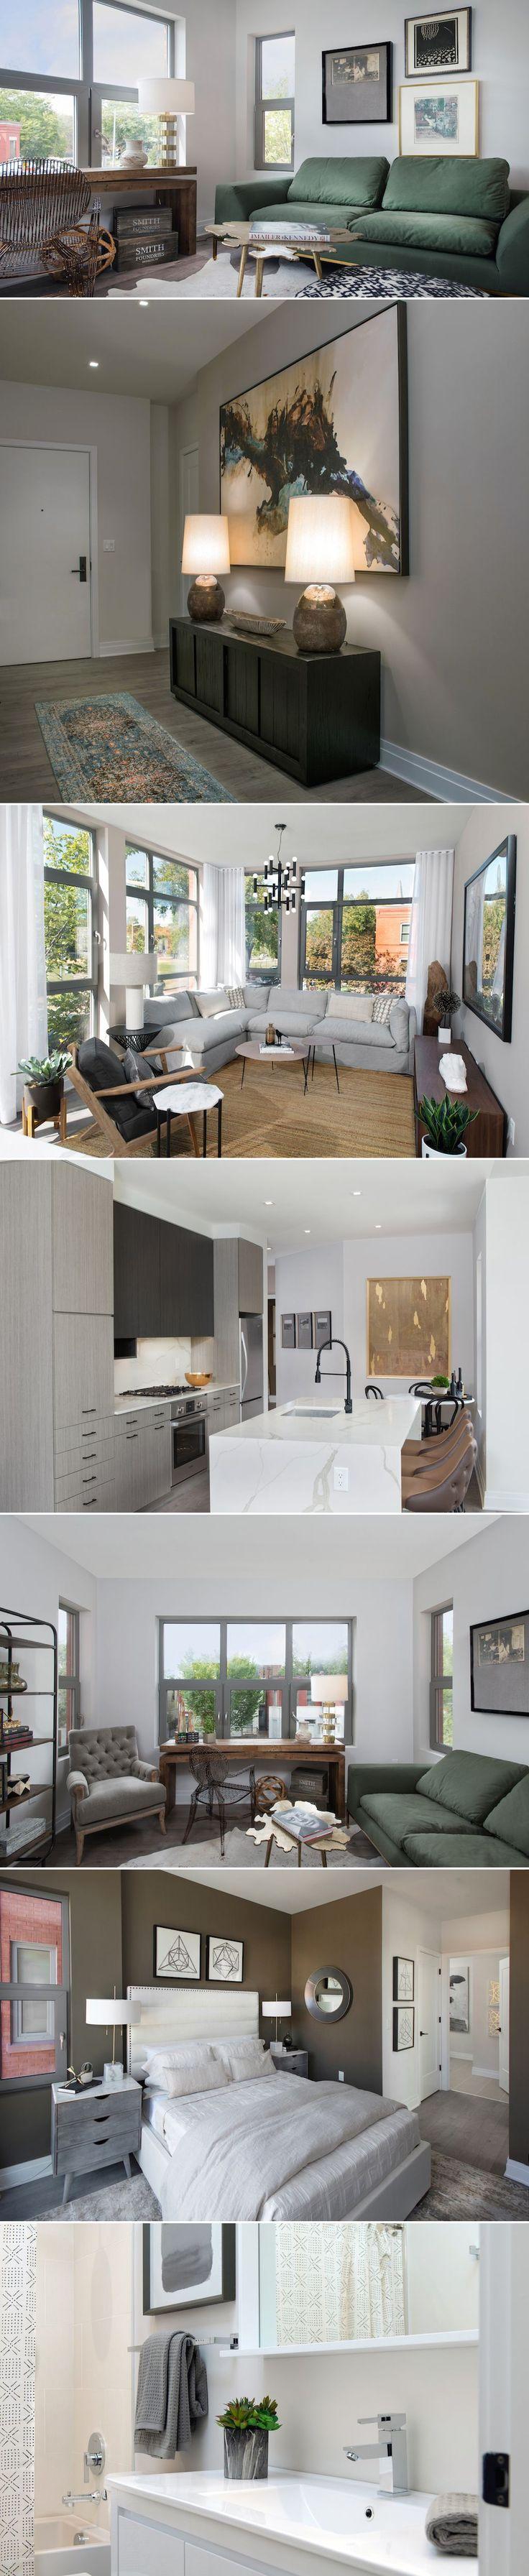 1368 best Interiors & Home Design images on Pinterest